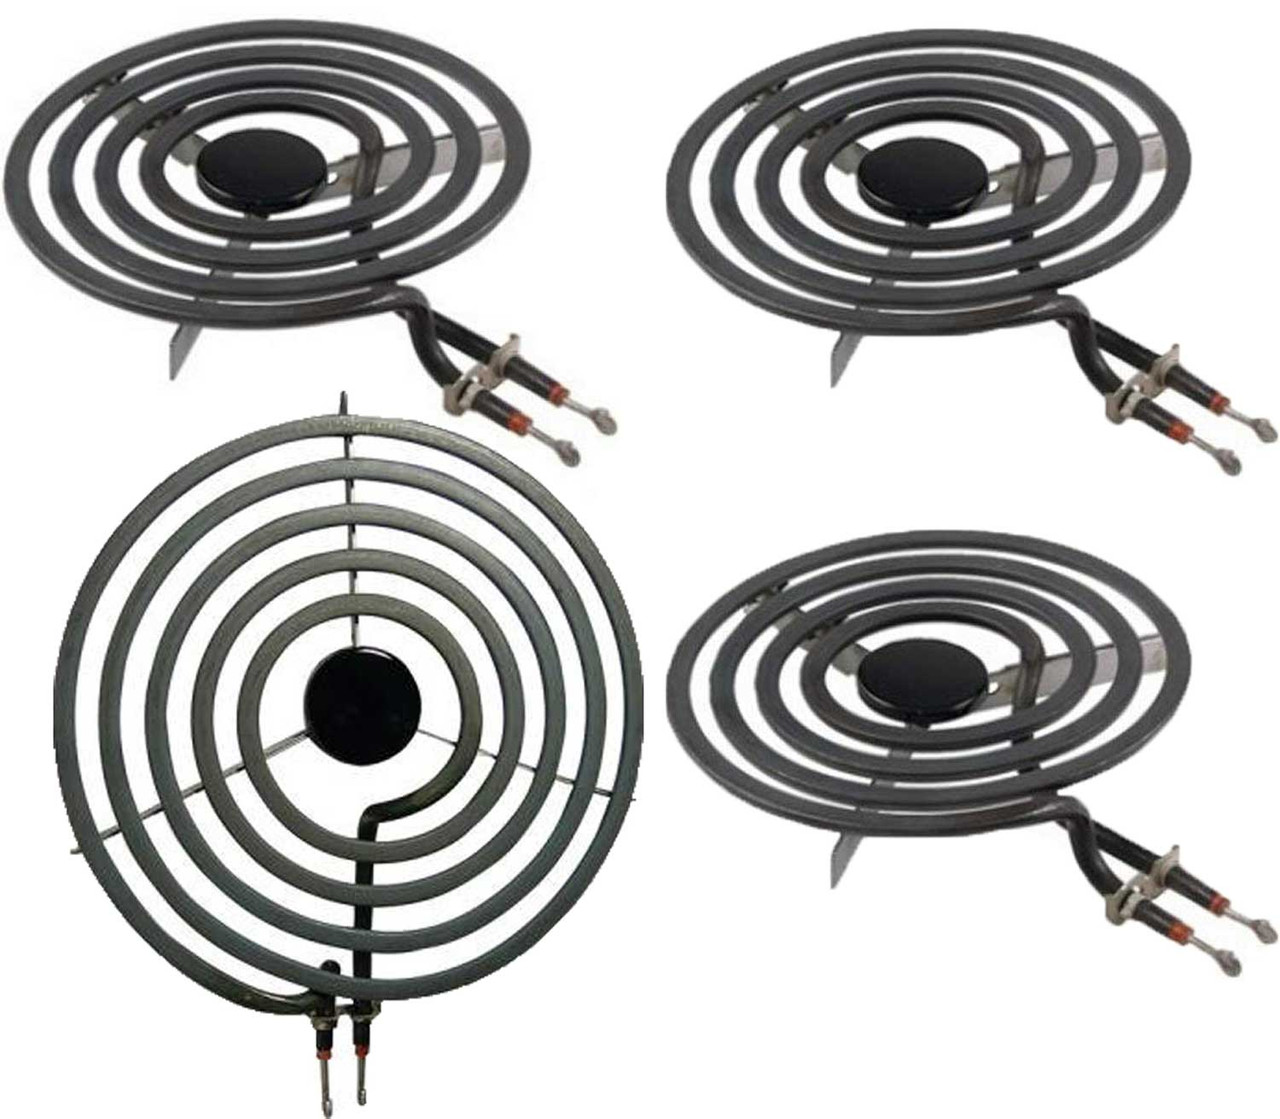 4 Pack MP22YA Electric Range Burner Element Unit Set 4- MP15YA 2 f... 2 MP21YA